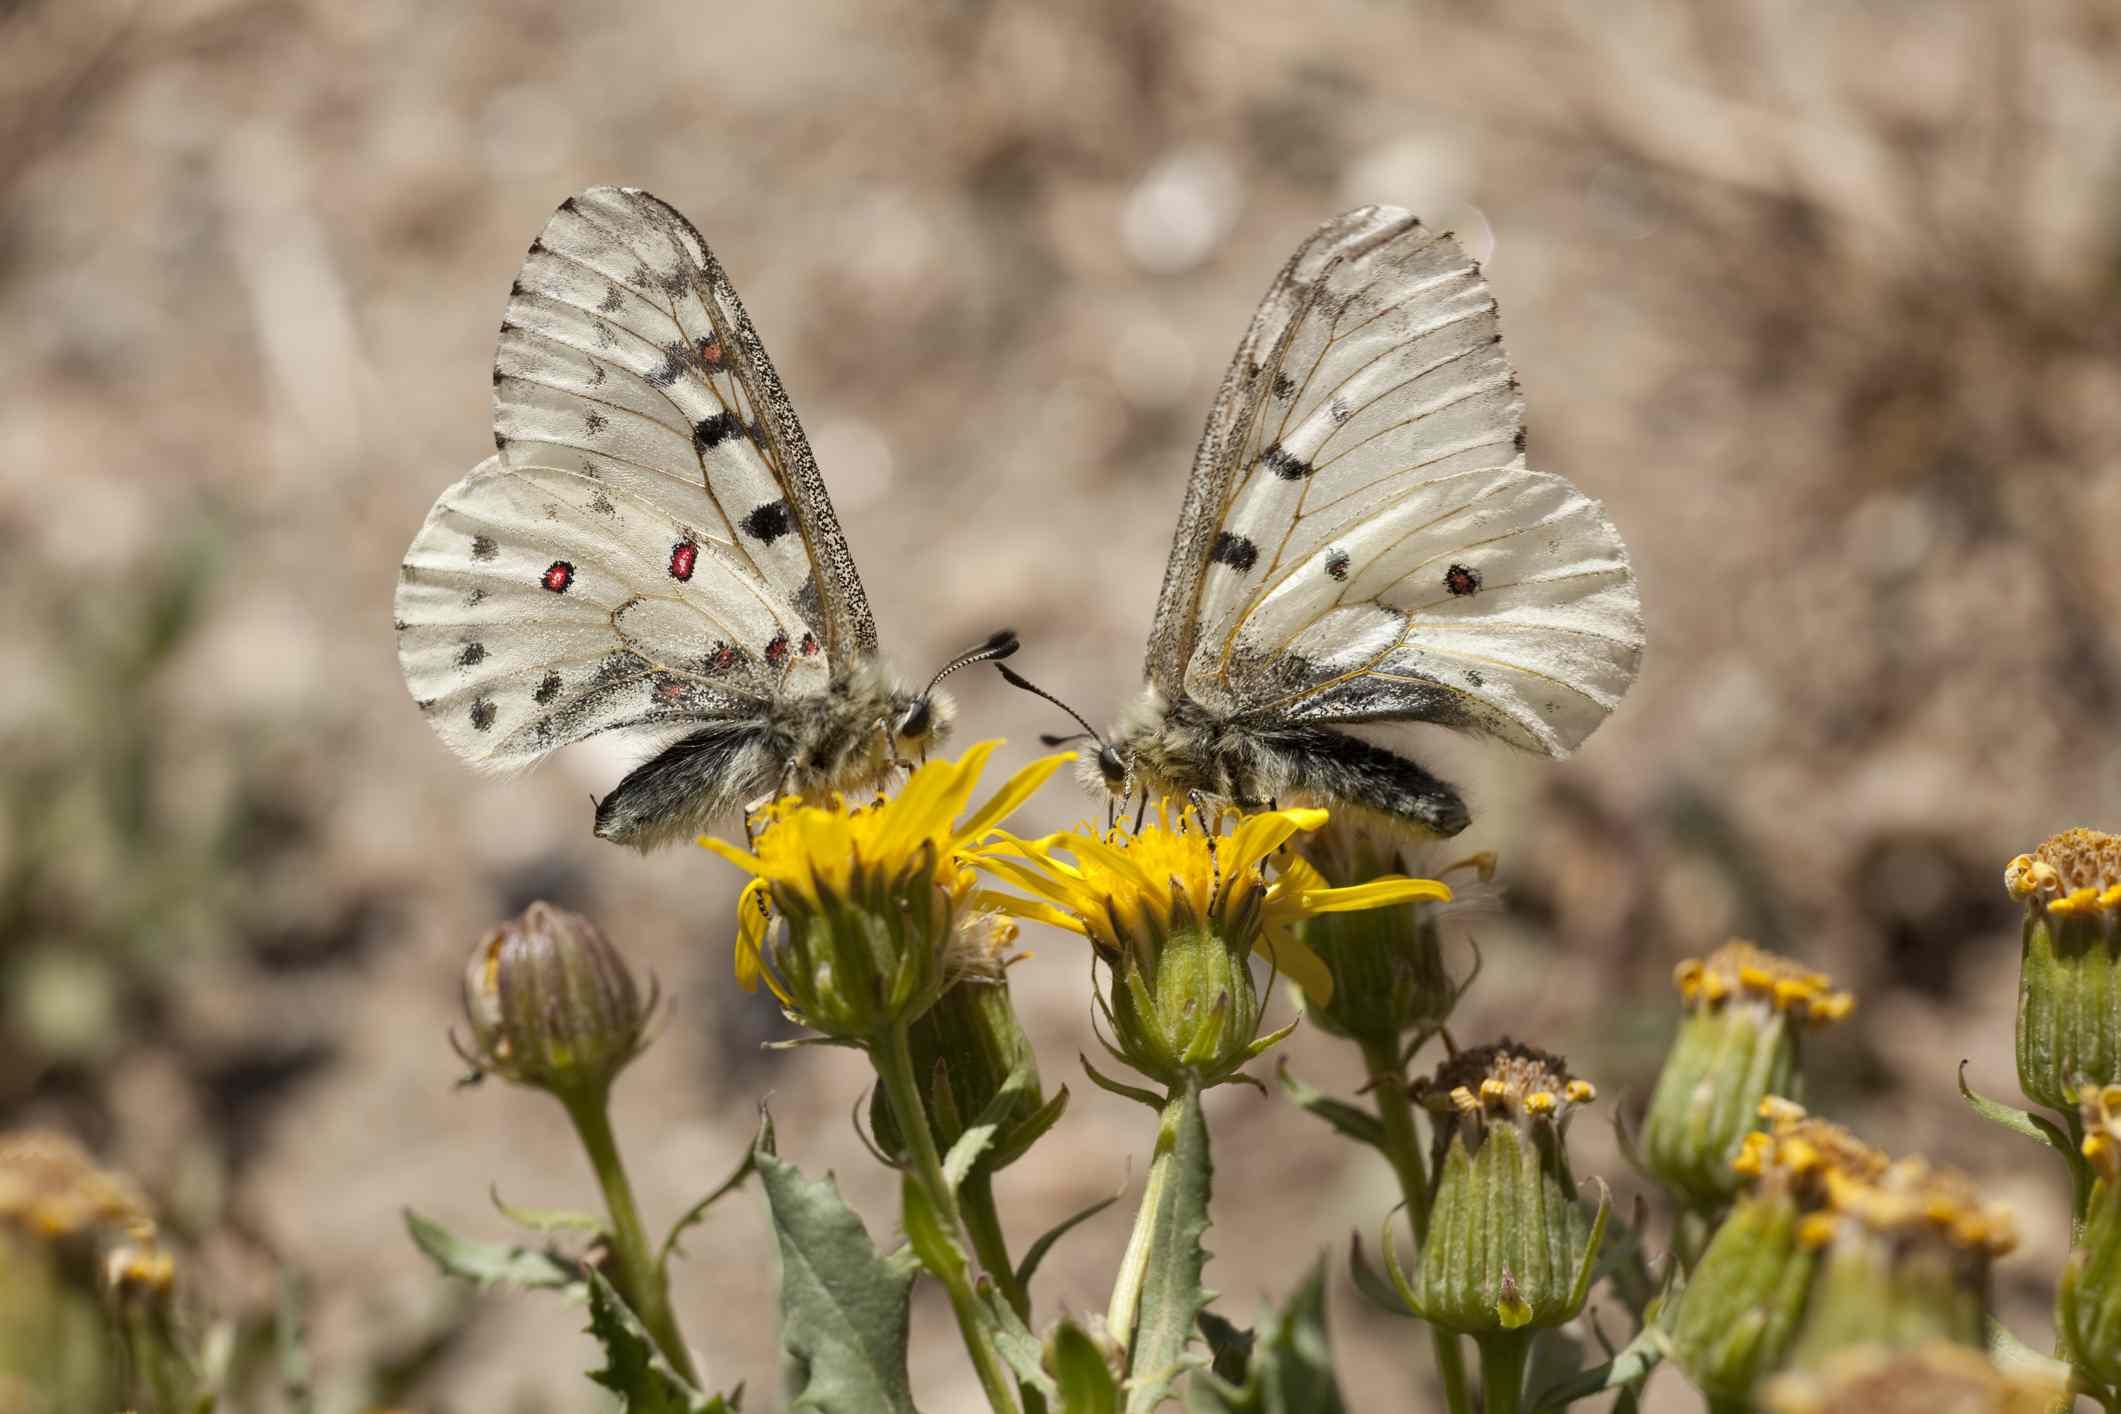 Phoebus parnassian butterflies in Colorado National Park